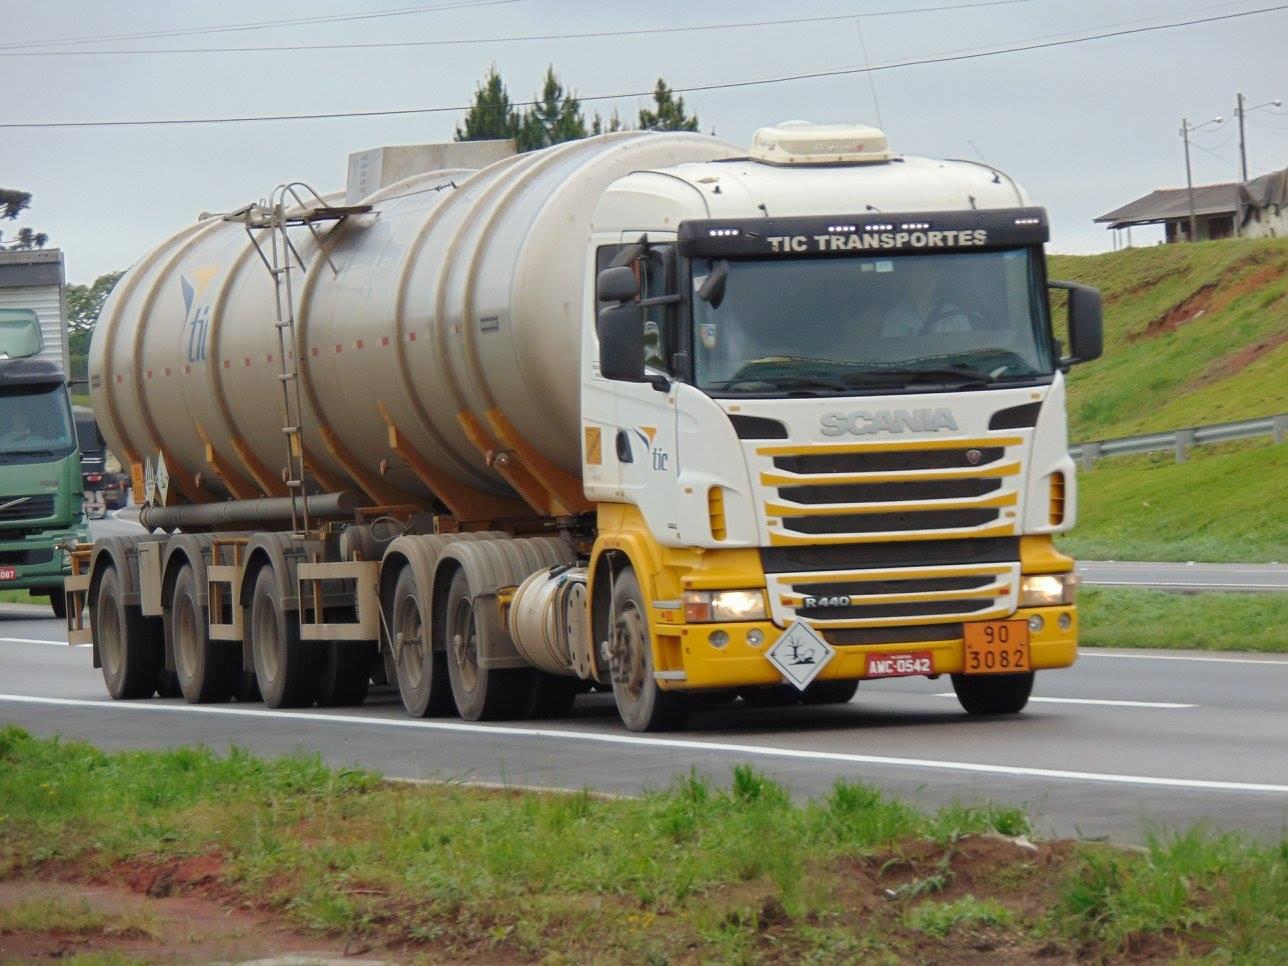 Scania-photo-5-1--2015-37